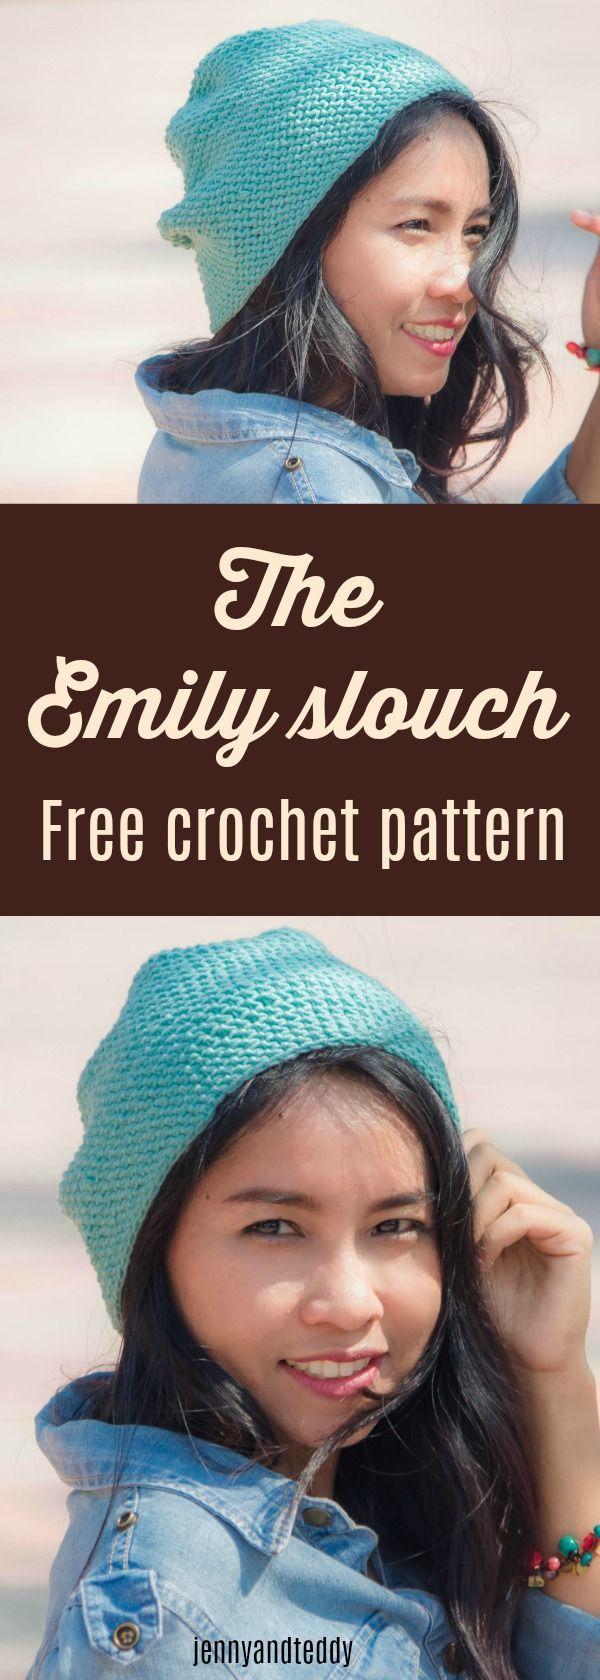 Free crochet pattern the Emily slouch beanie hat beginner friendly by jennyandteddy